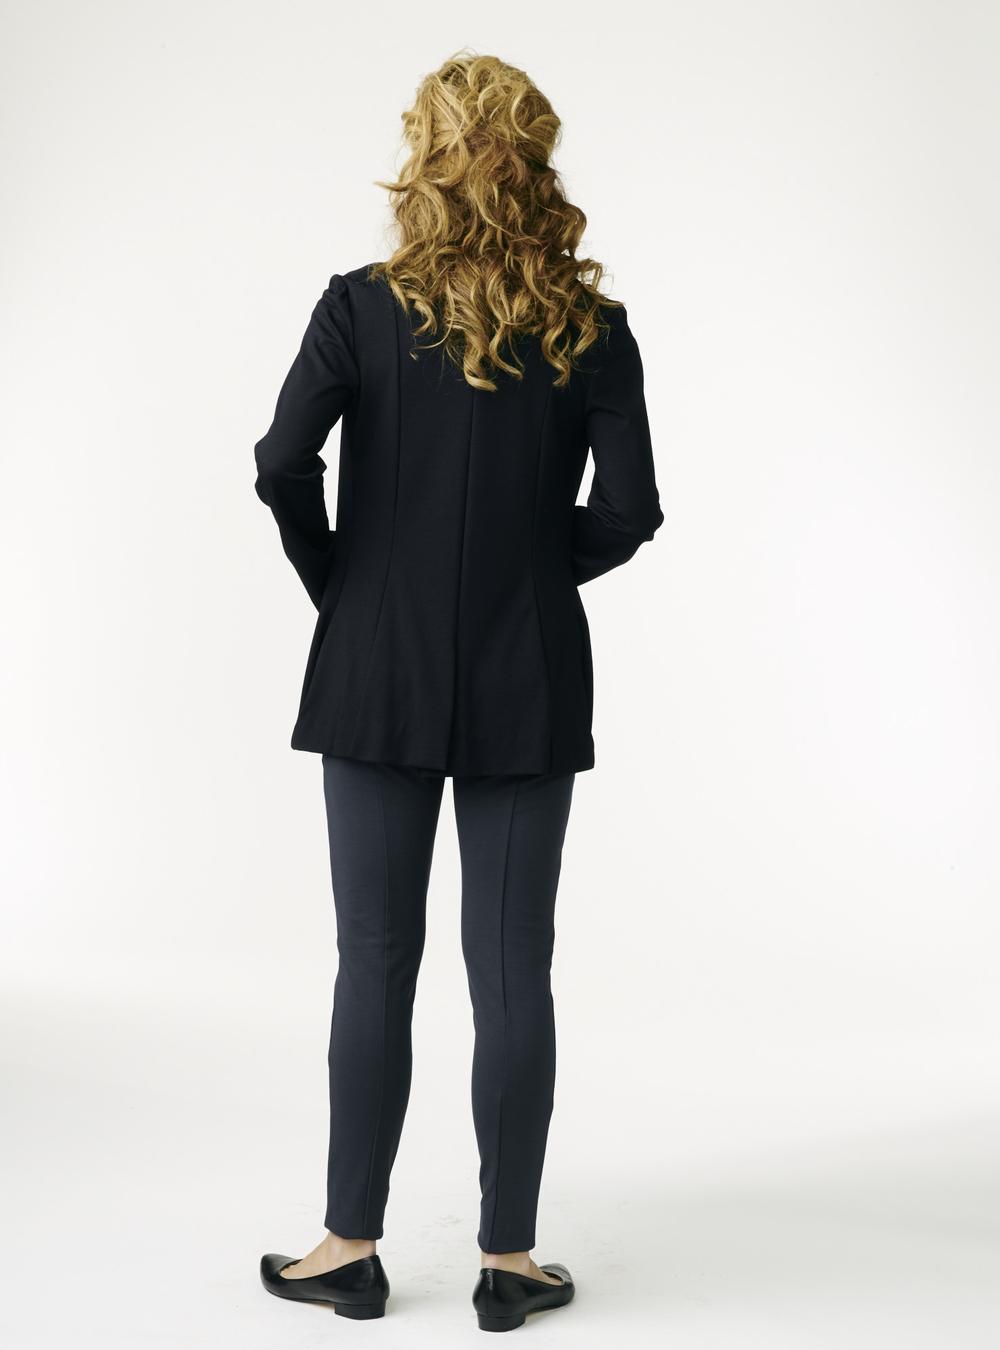 195410fb11f Lasting Impression Jacket — Camilla Olson All Products